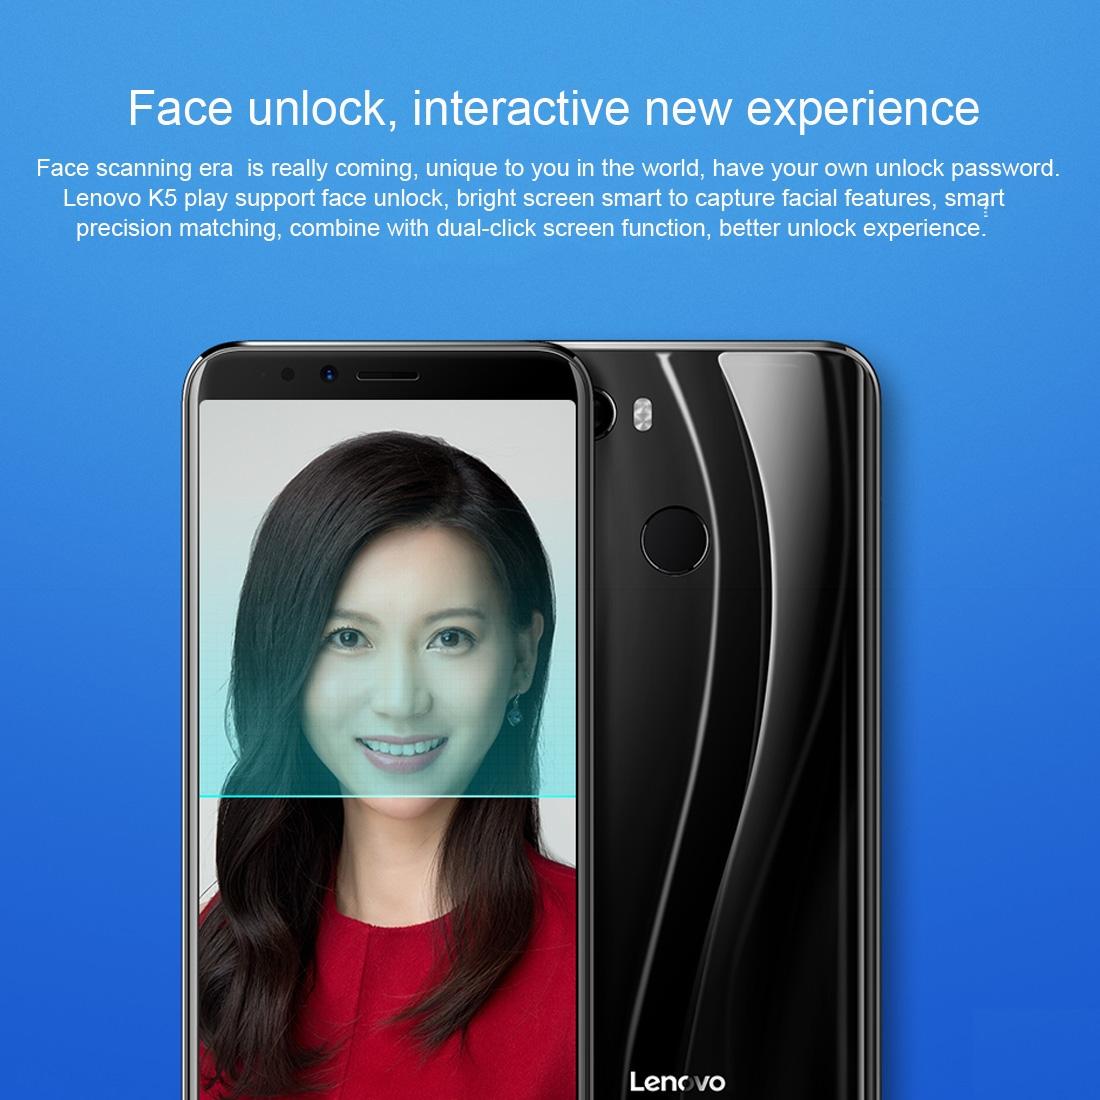 i.ibb.co/D8XCjLC/Smartphone-3-GB-32-GB-Jogo-Lenovo-K5-Play-Azul-7.jpg